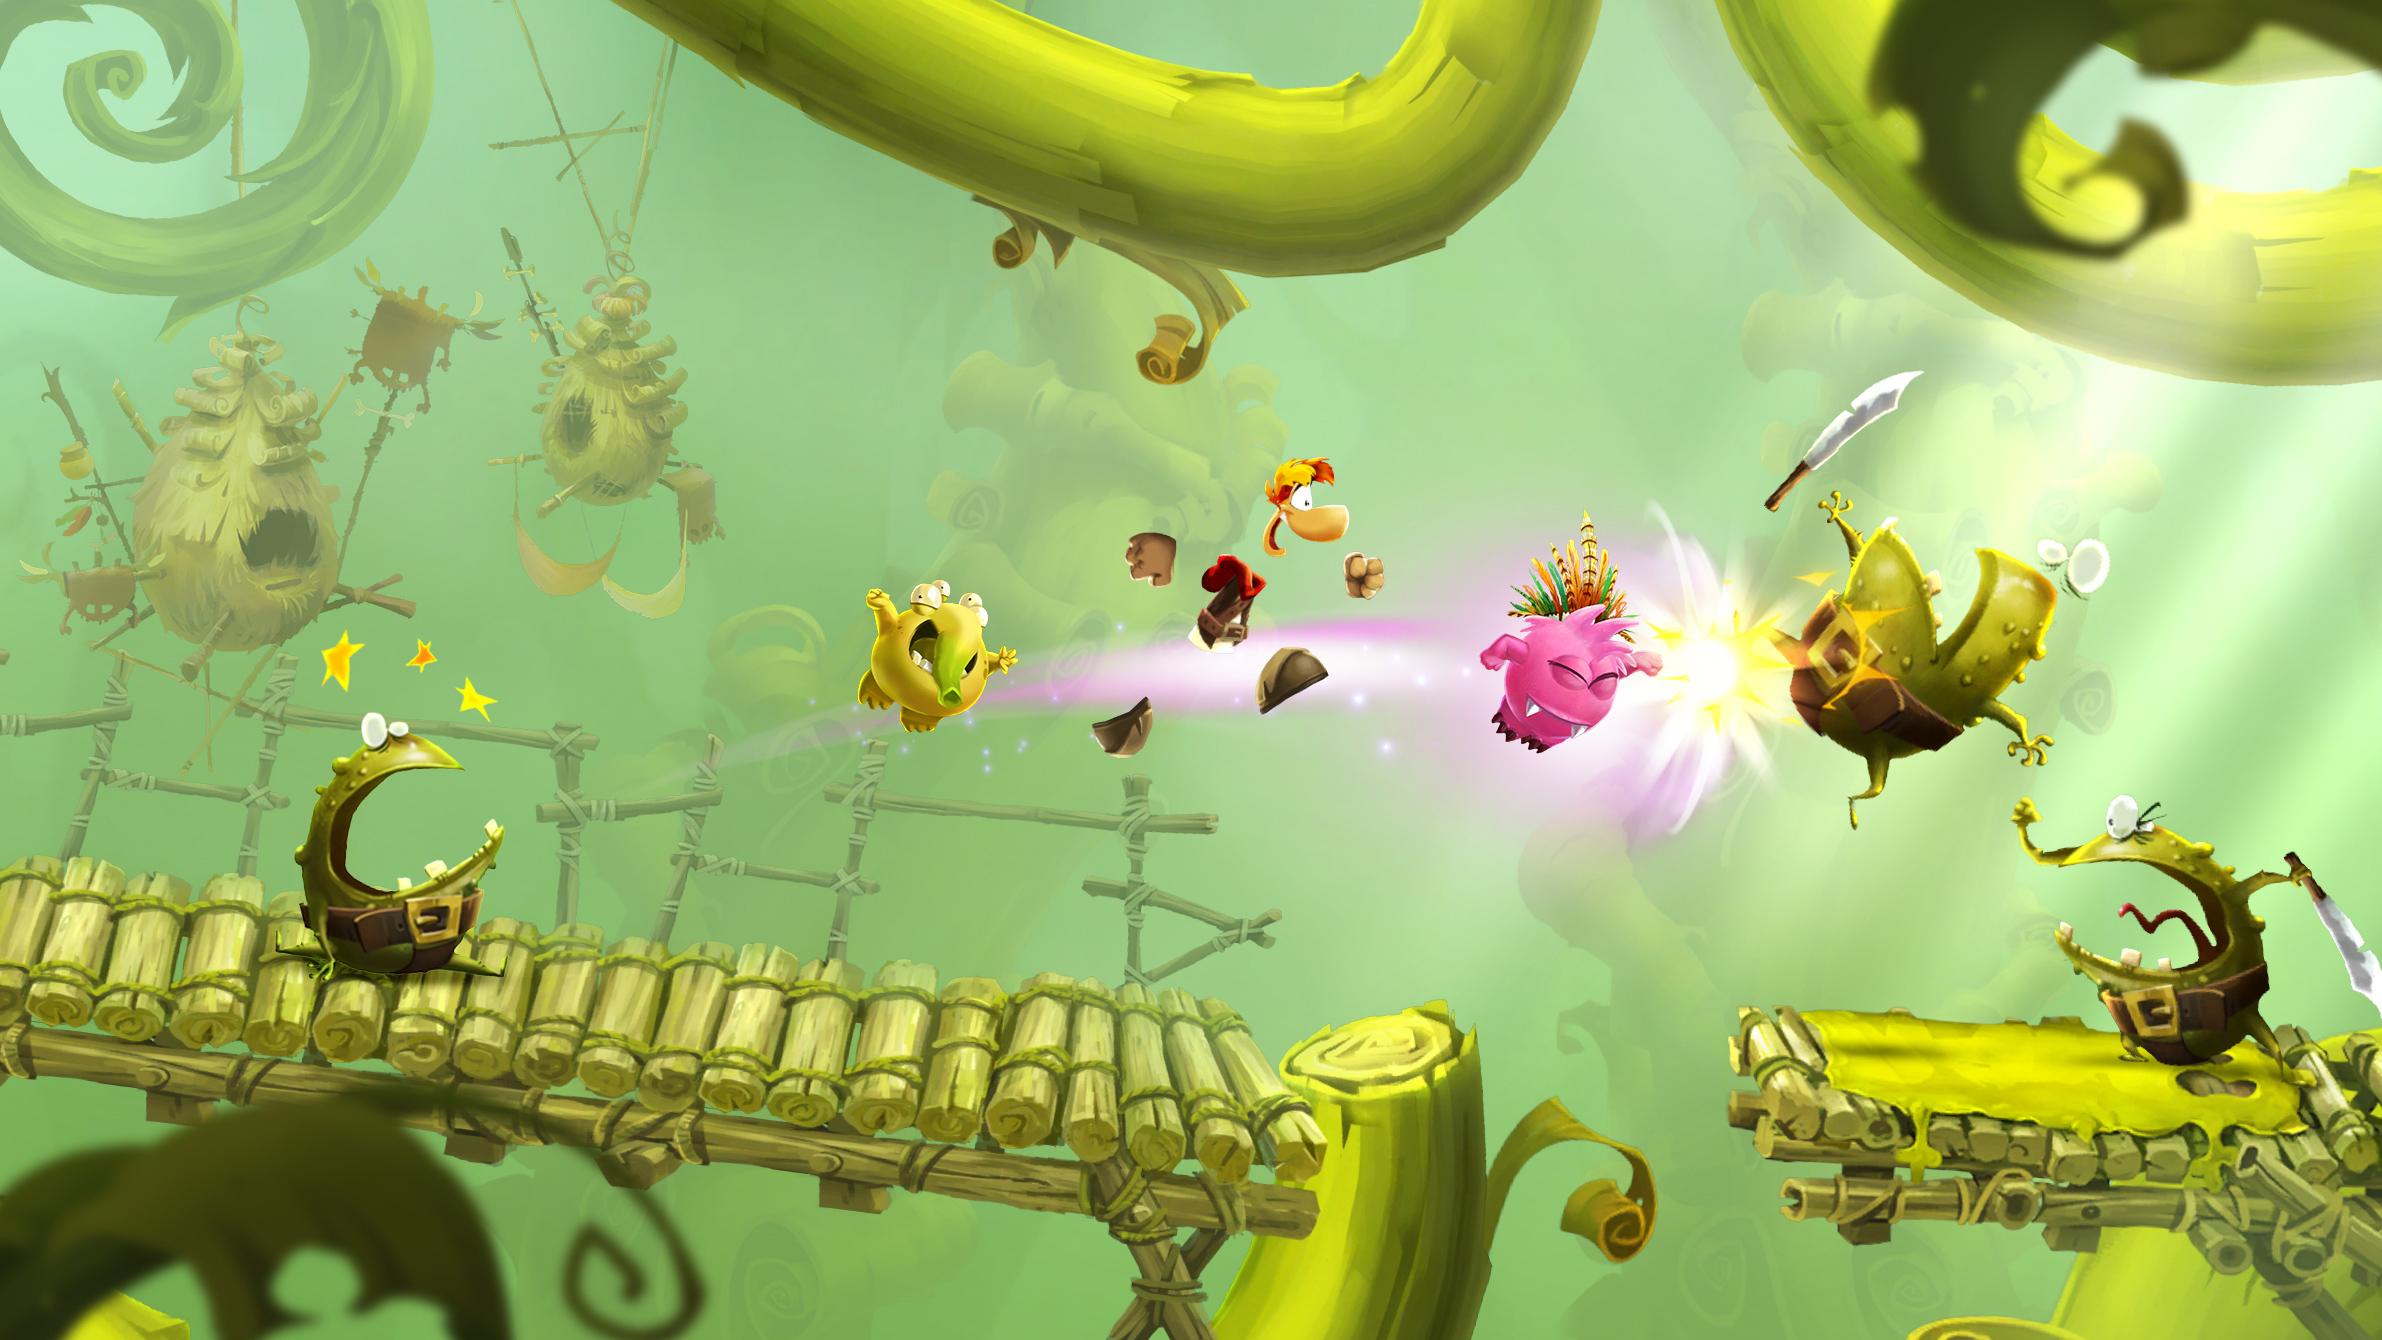 Too bad Rayman Adventures is skipping consoles screenshot